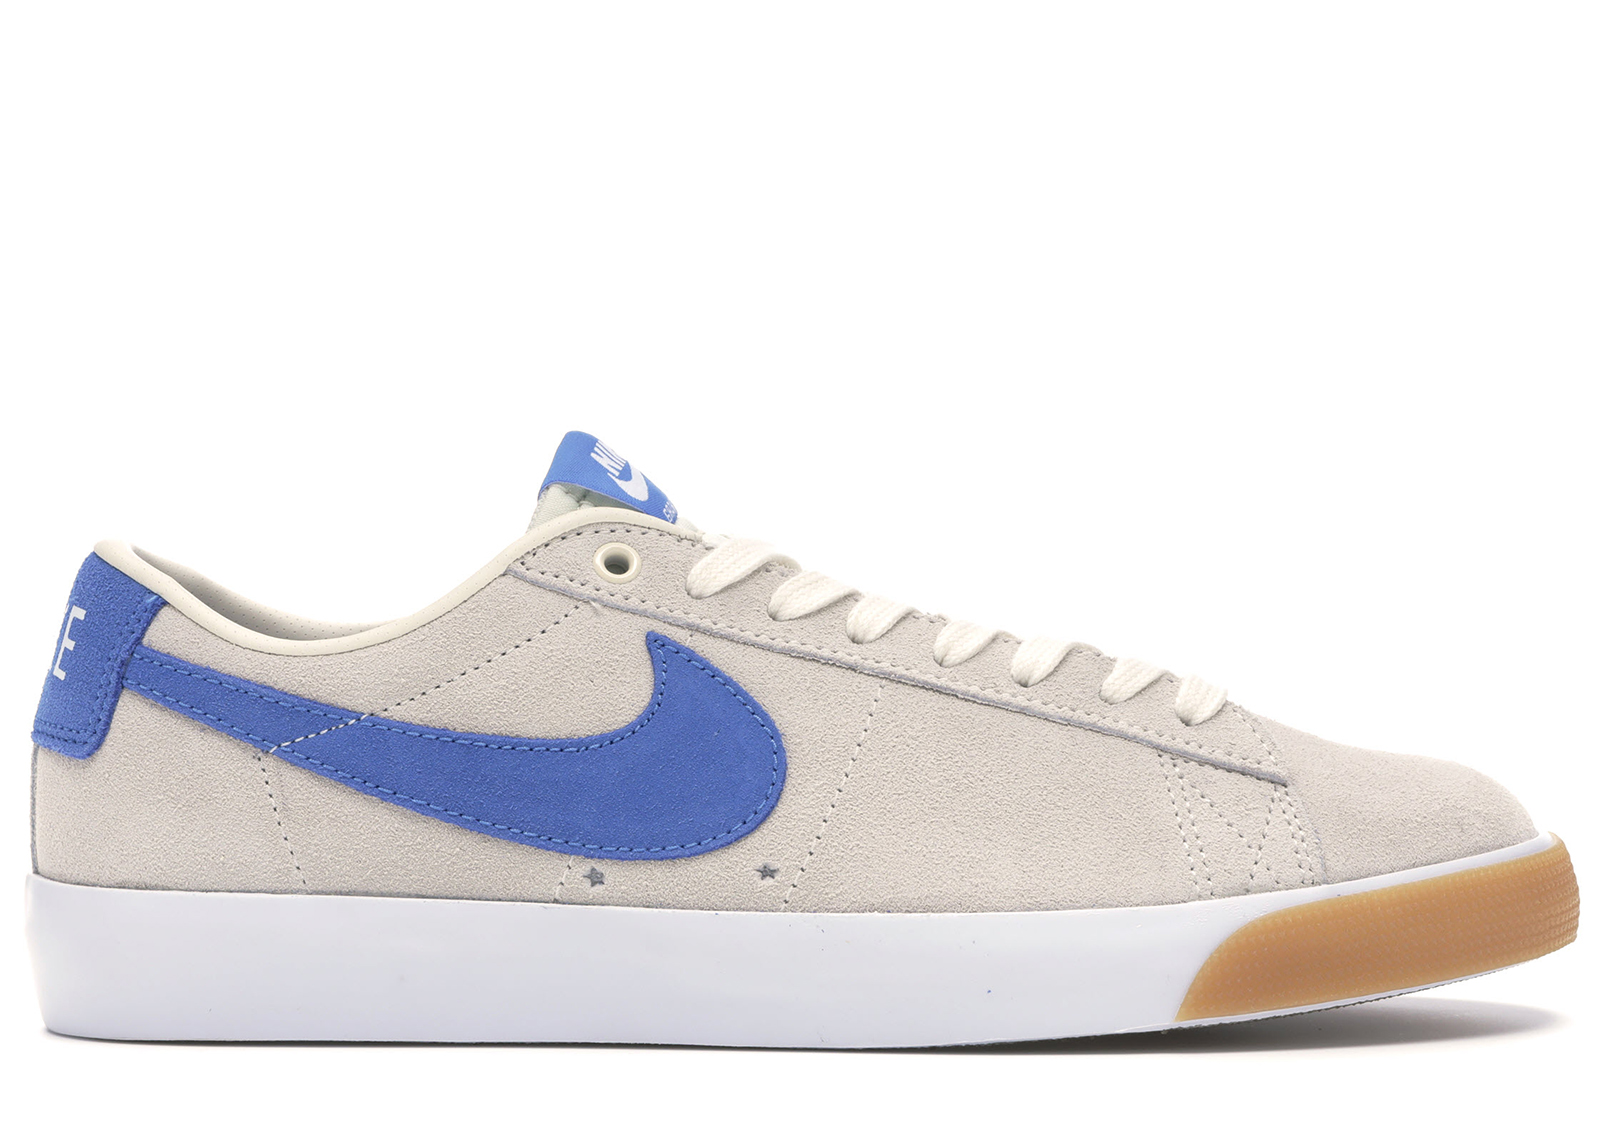 Nike SB Blazer Low Pale Ivory Pacific